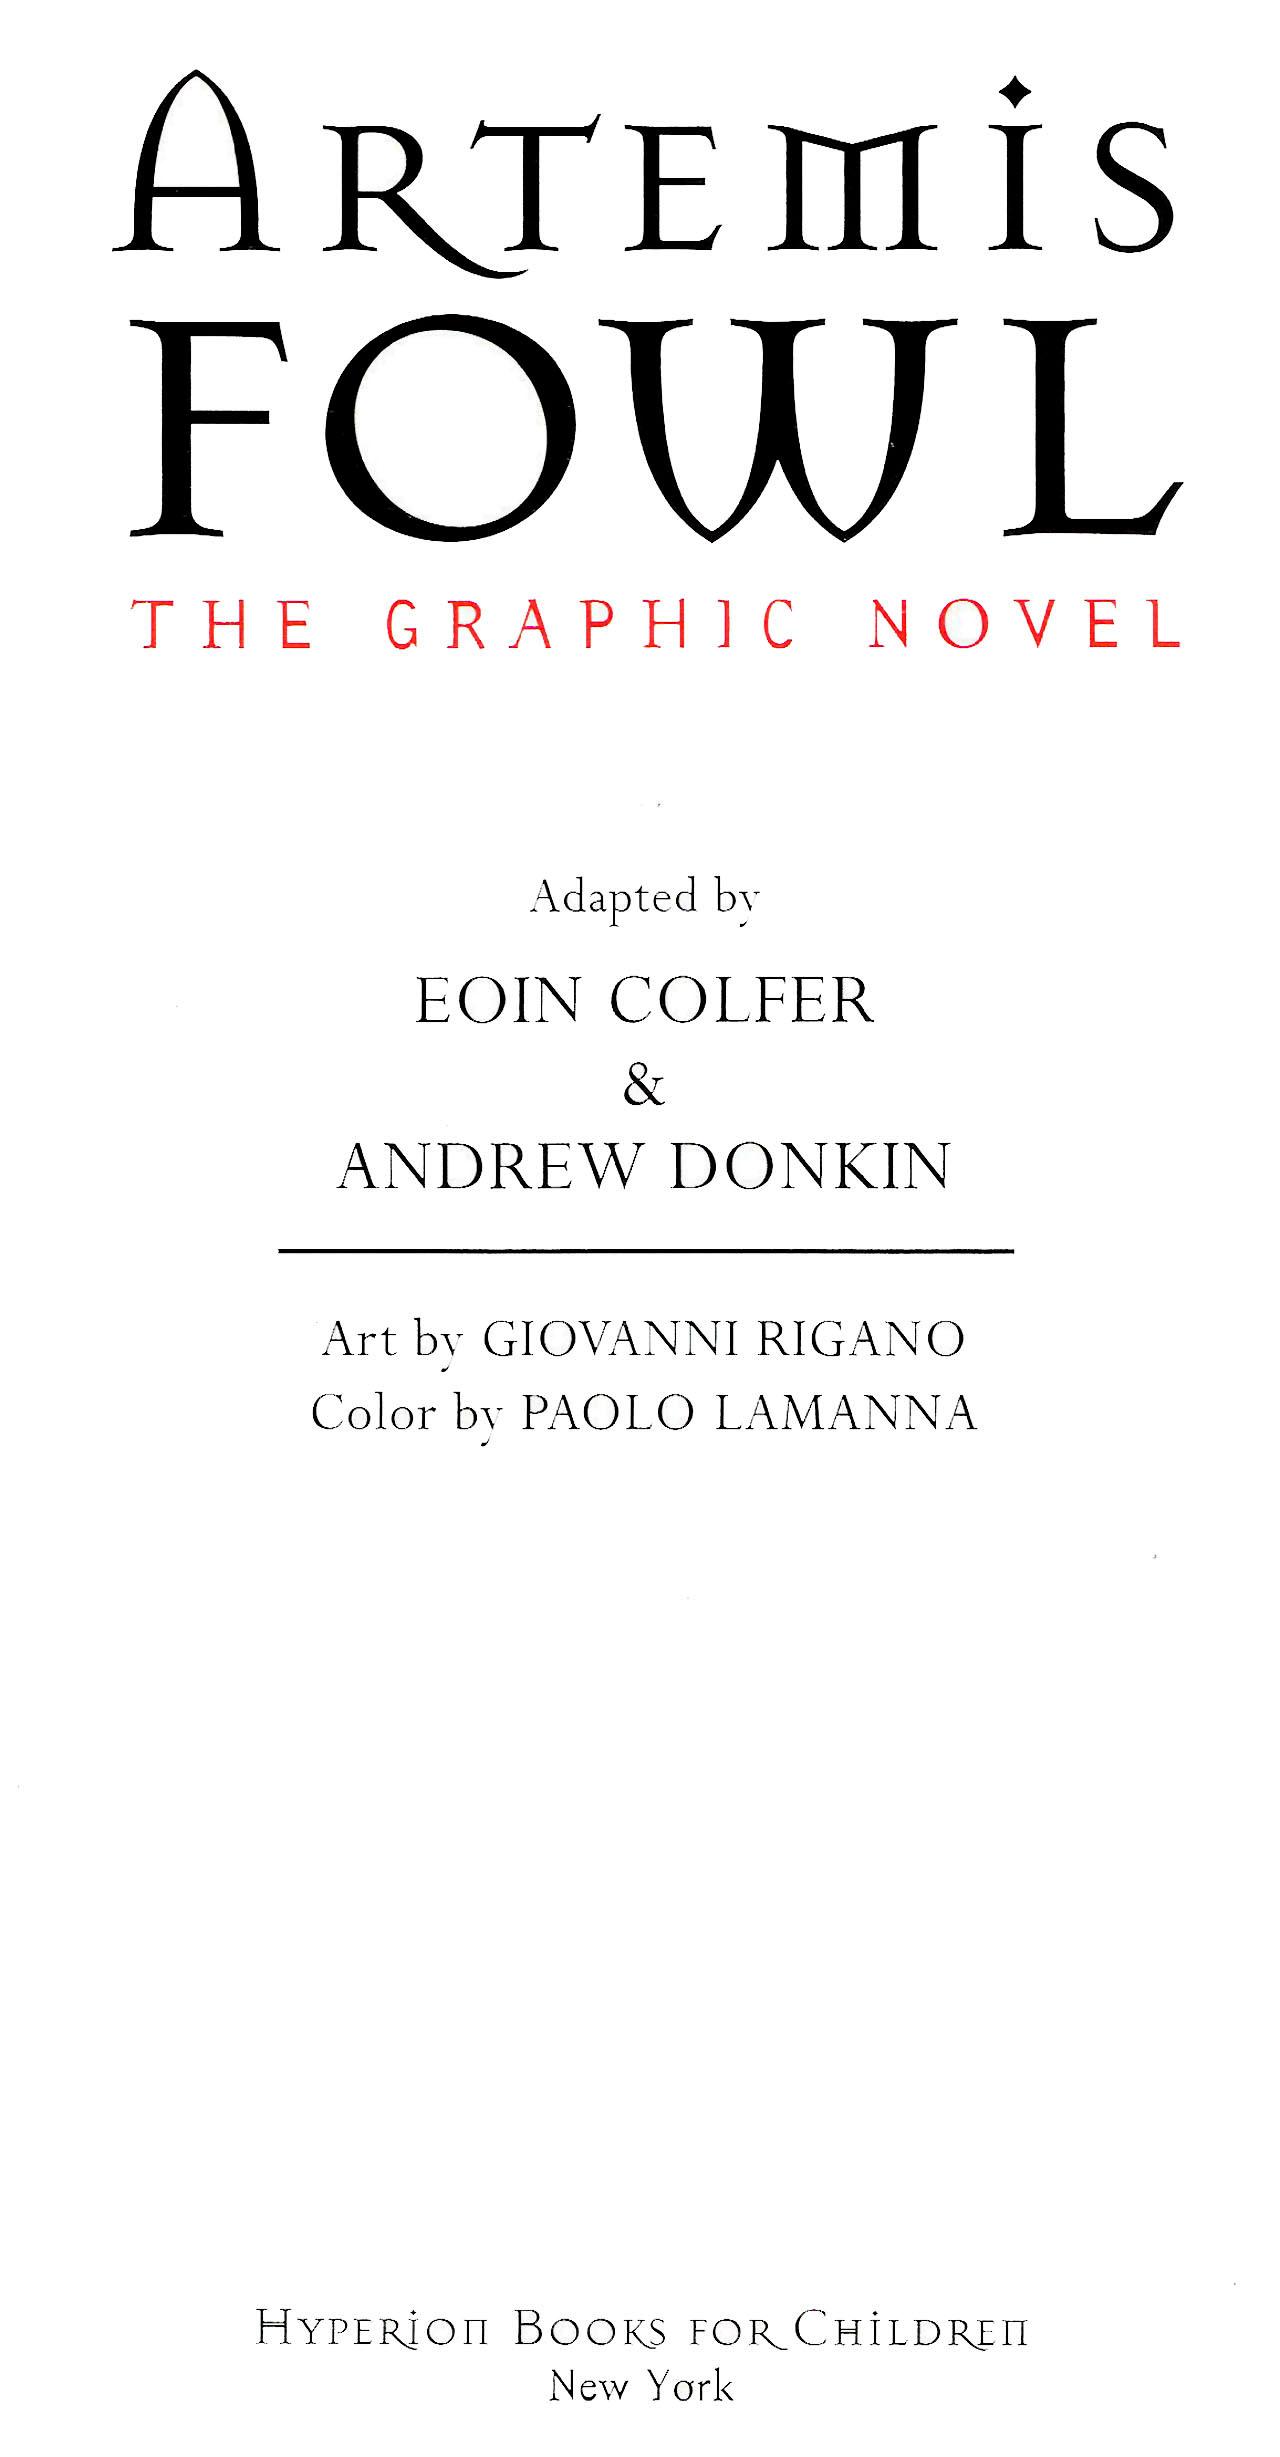 Read online Artemis Fowl: The Graphic Novel comic -  Issue #Artemis Fowl: The Graphic Novel Full - 3